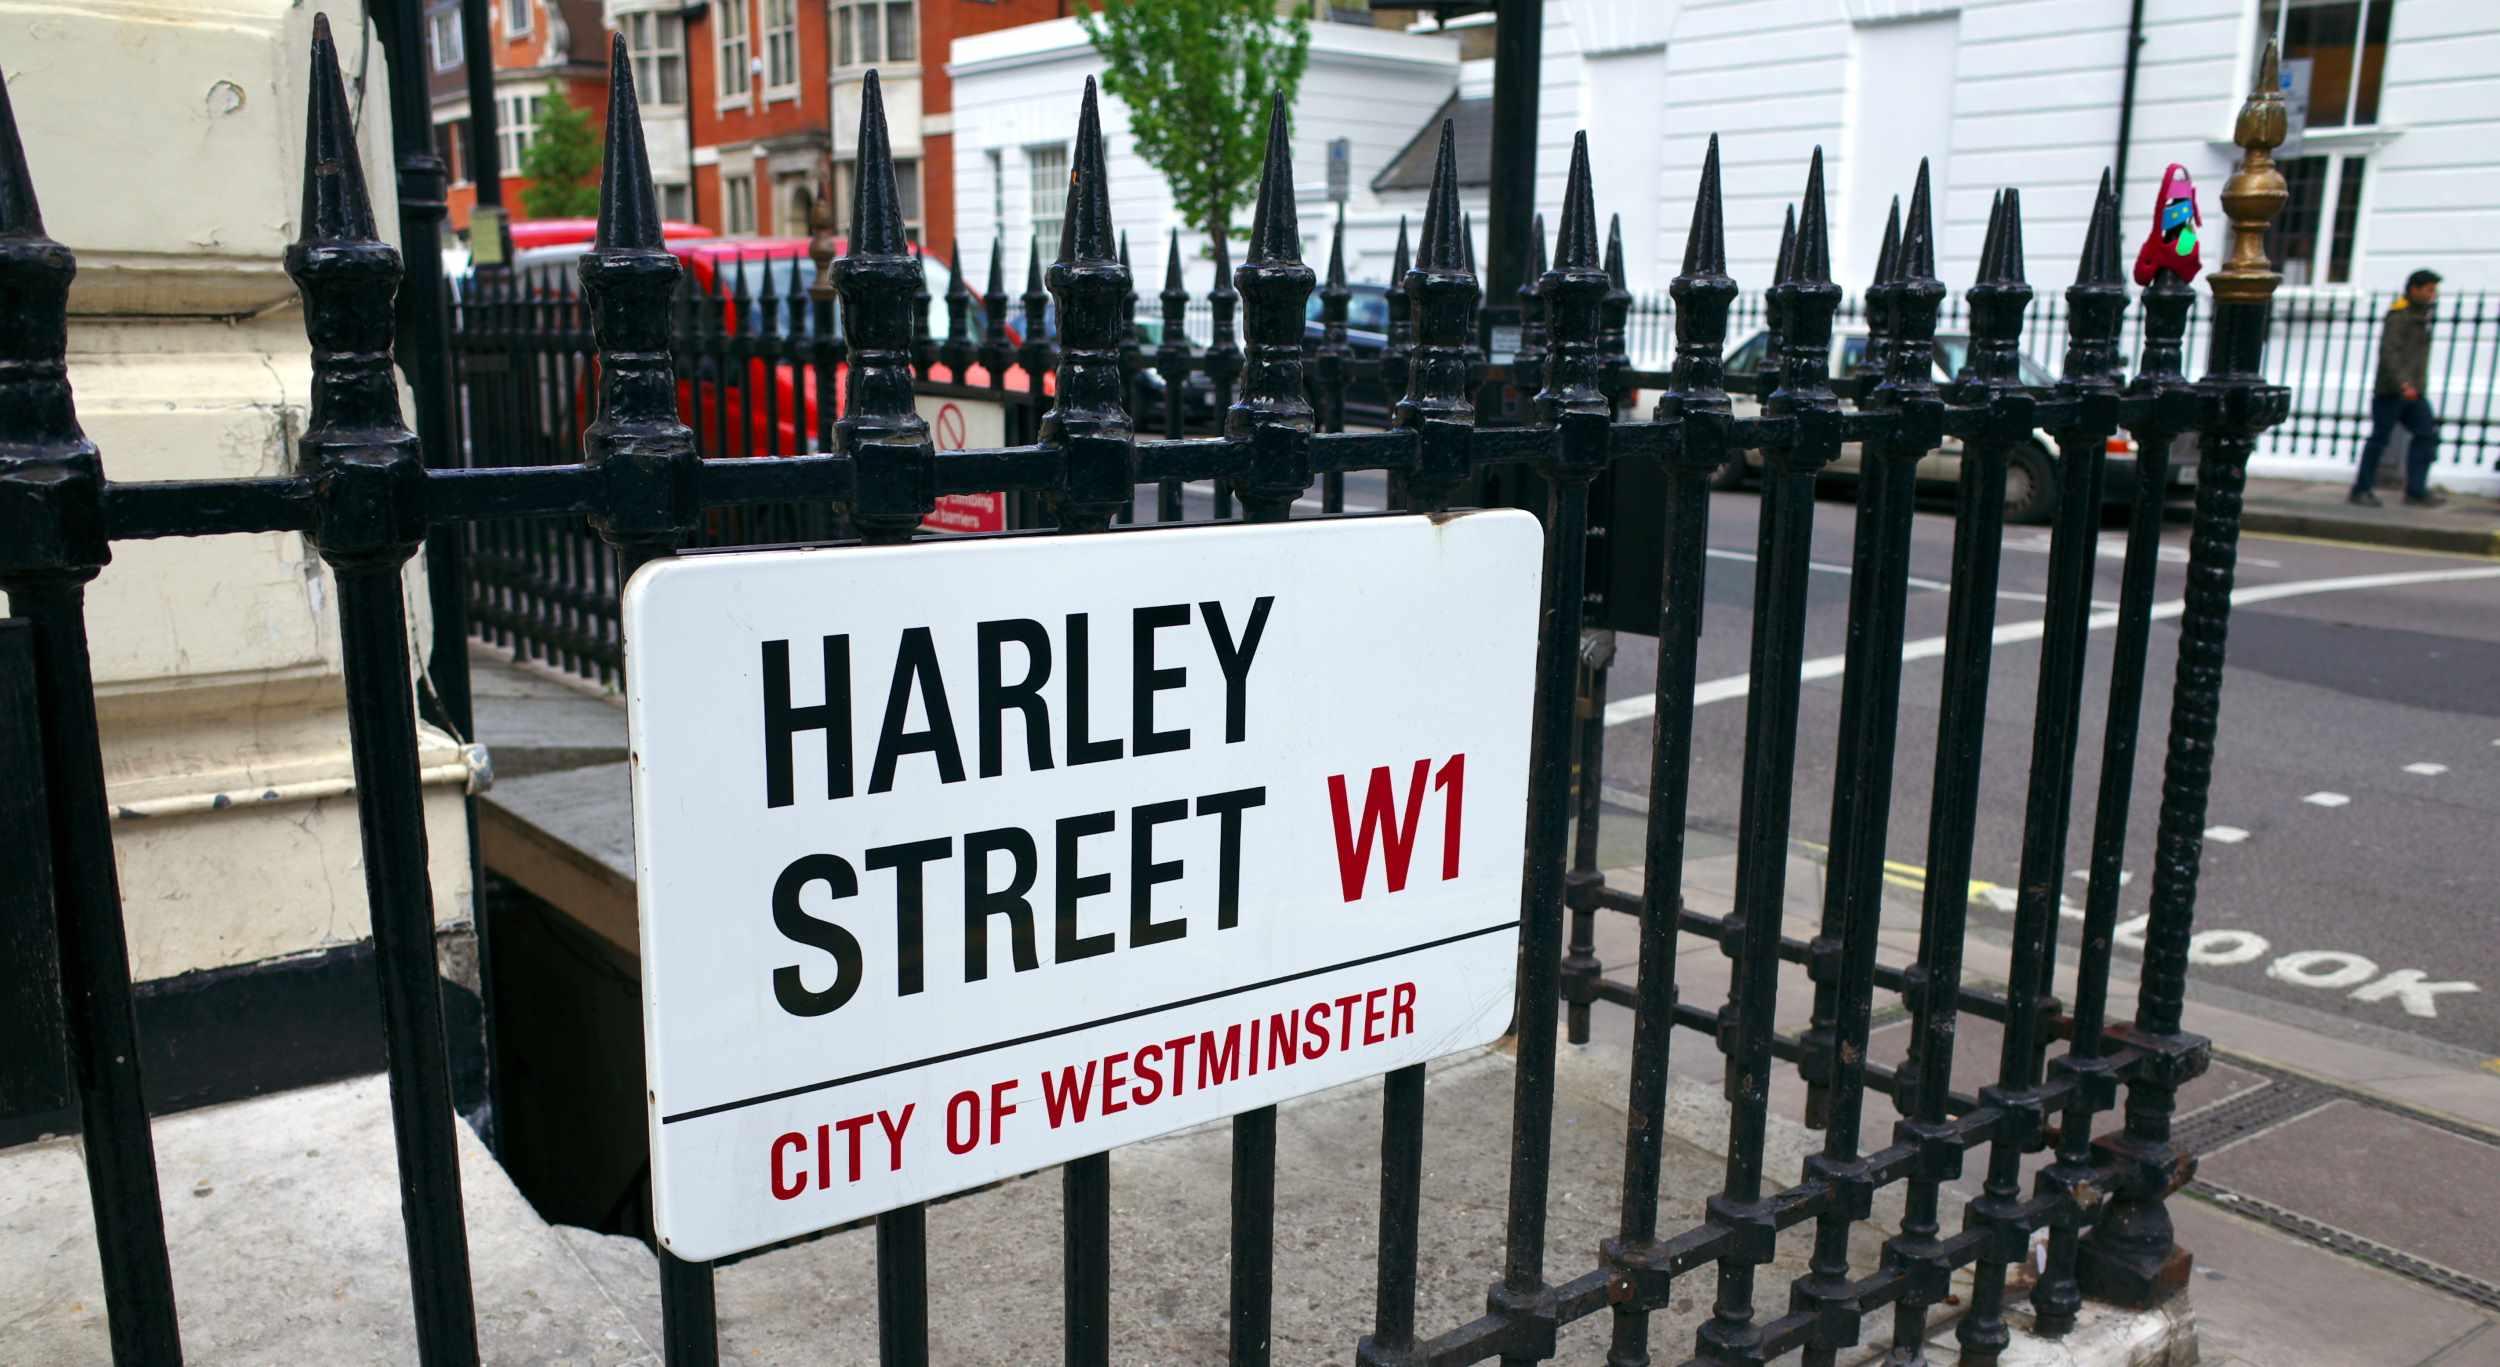 private_psychiatrists_london_harley_street.jpg